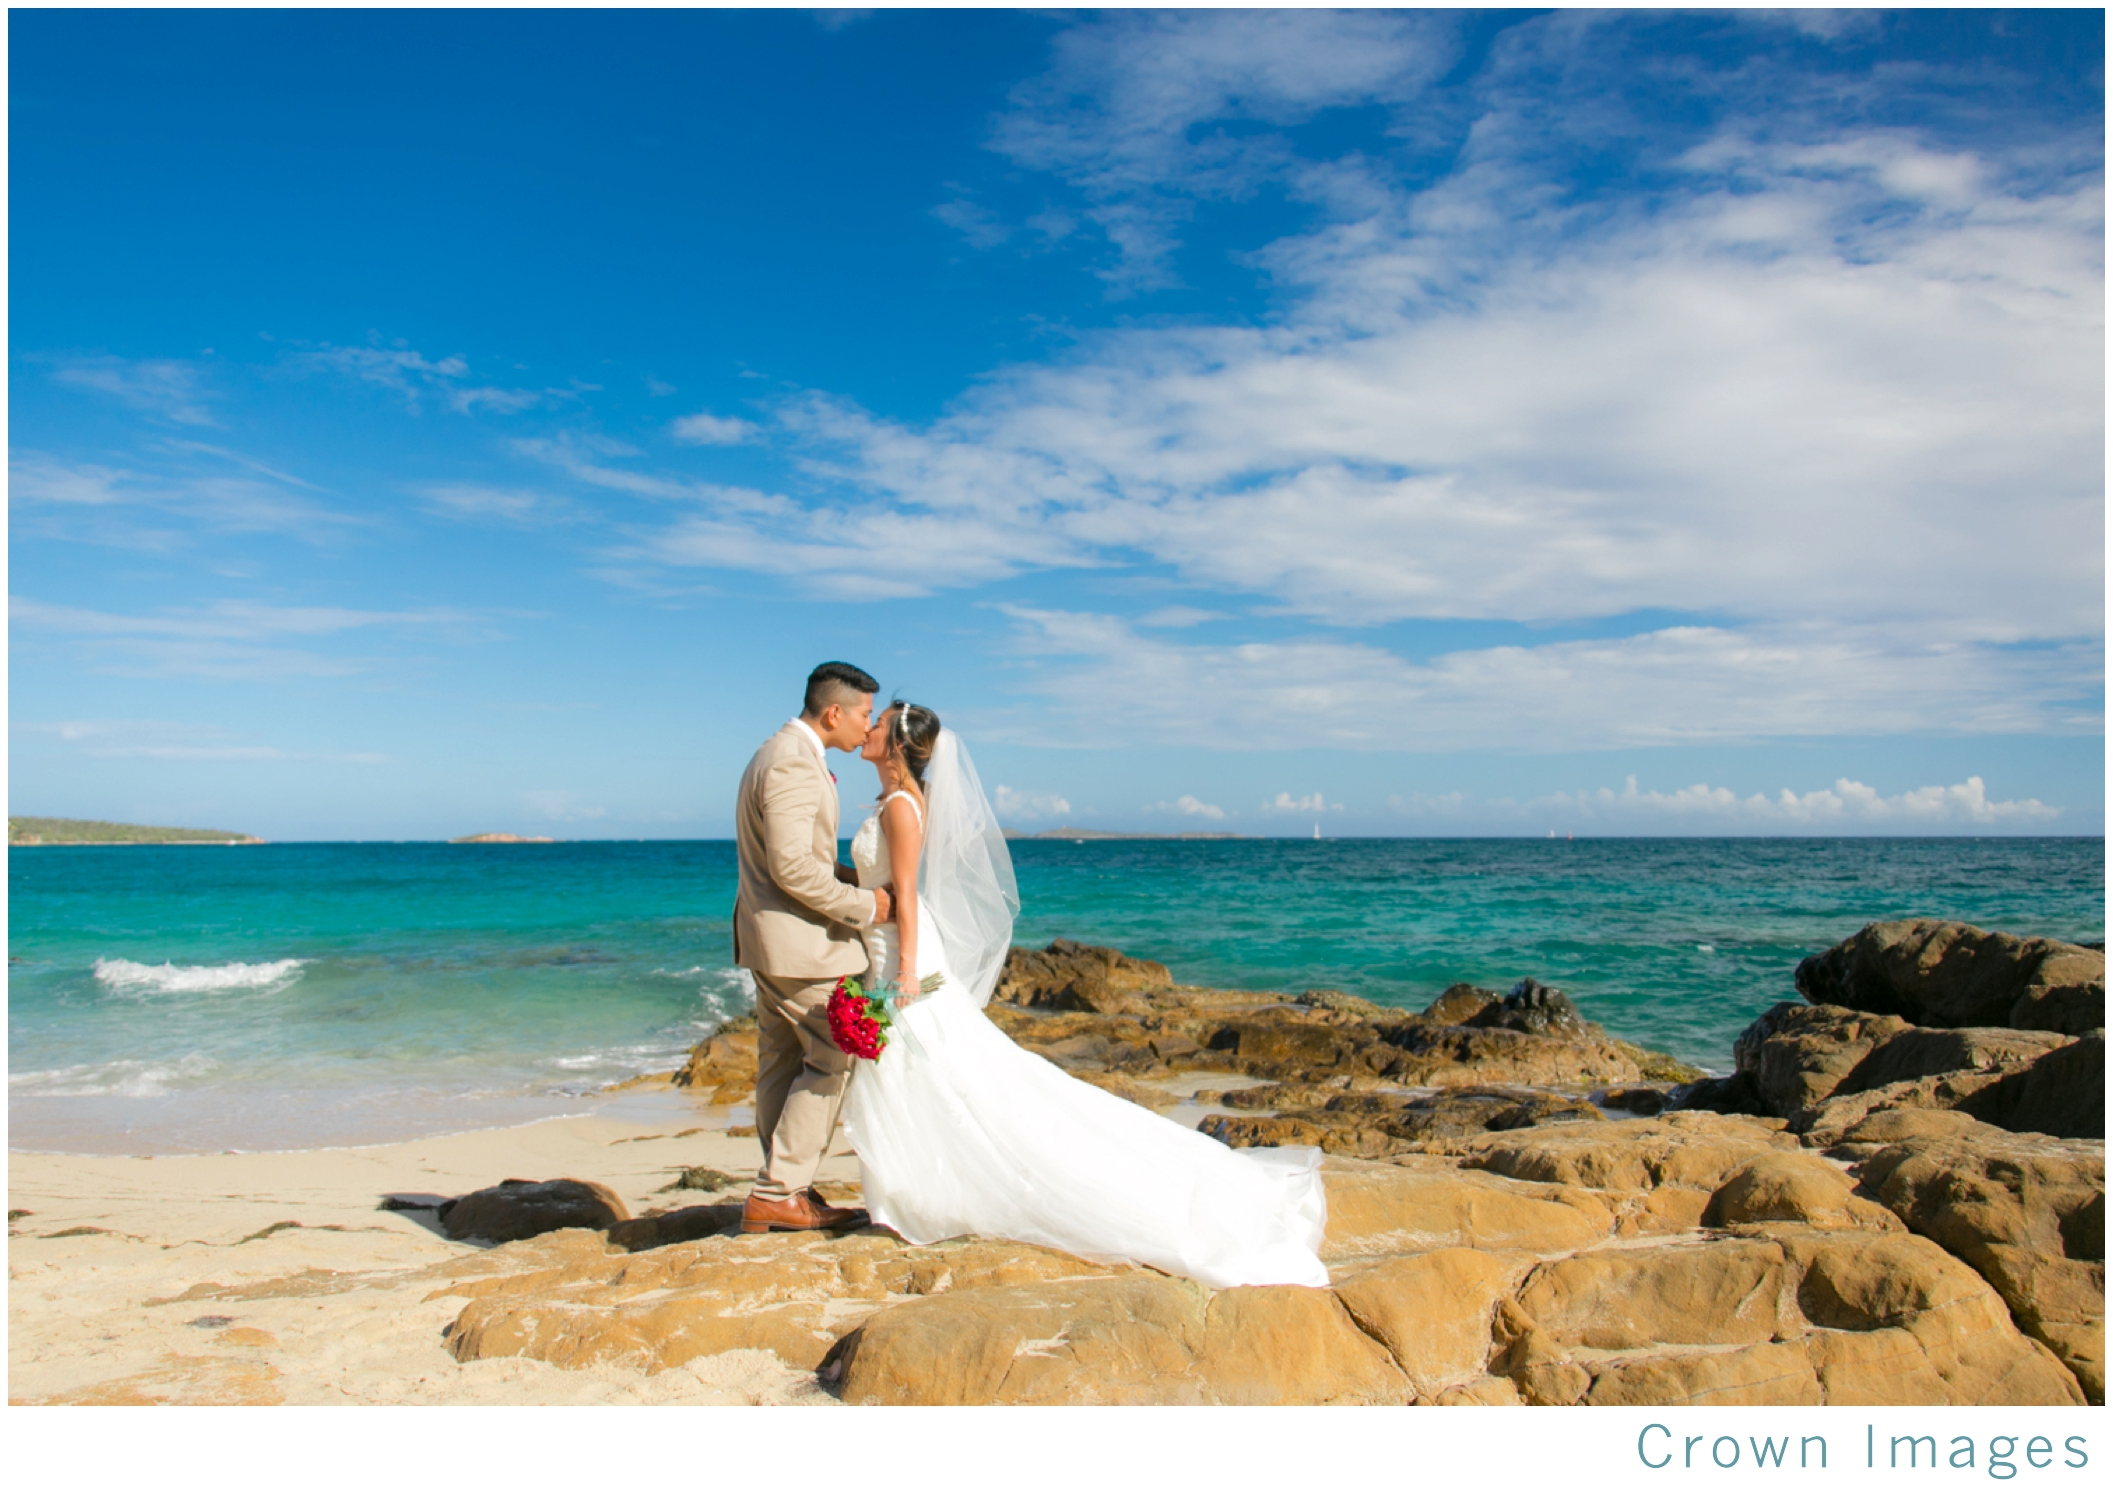 wedding-photos-st-thomas-marriott-frenchmans-reef_1818.jpg